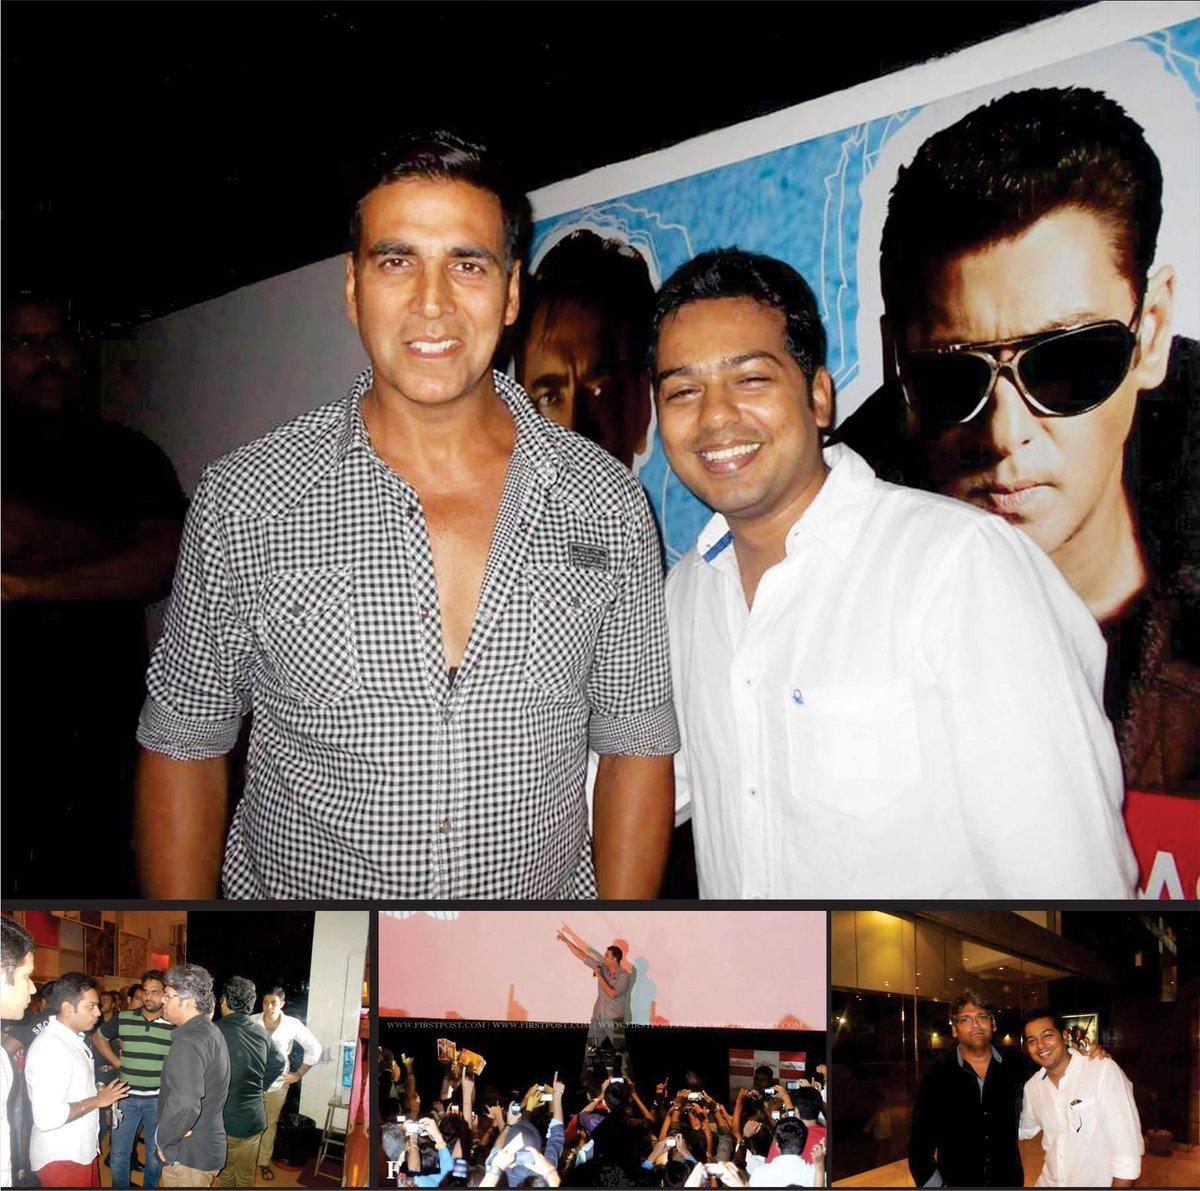 @akshaykumar sir today is my #birthday please wish ur biggest #fan from #gujarat https://t.co/FWIc7BLJ1d